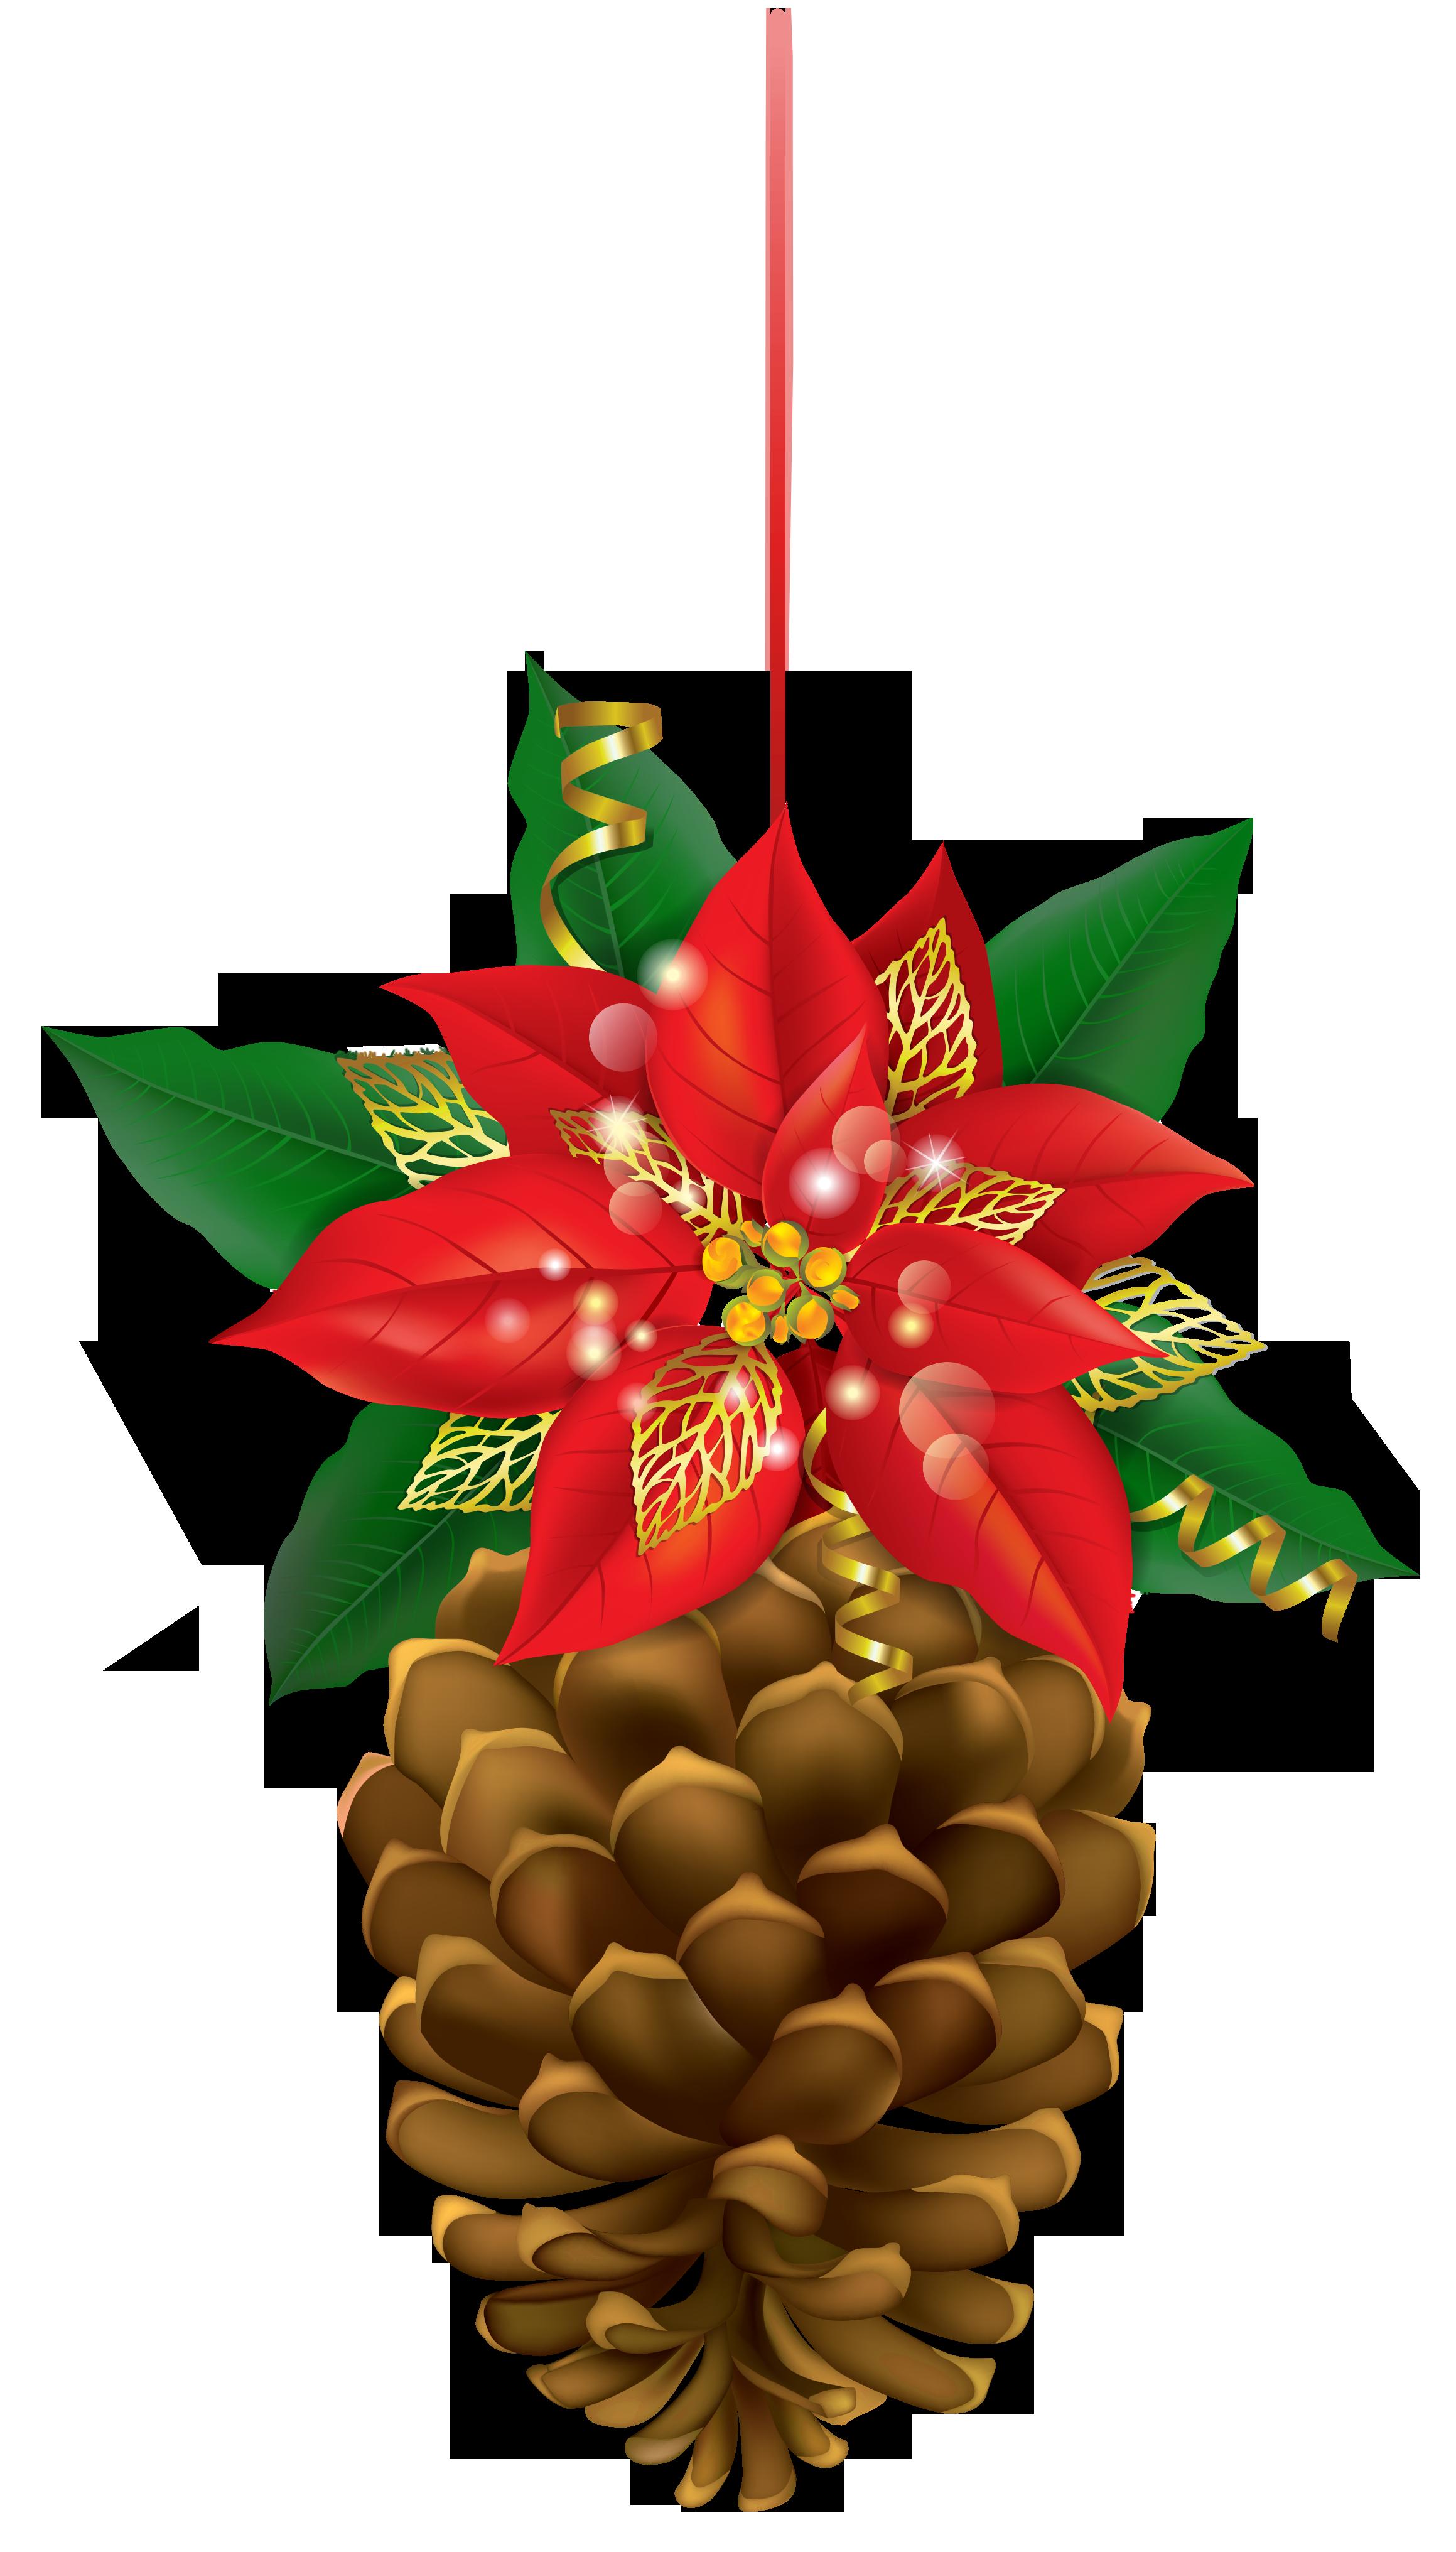 Poinsettias clipart ornament. Christmas pinecone with poinsettia